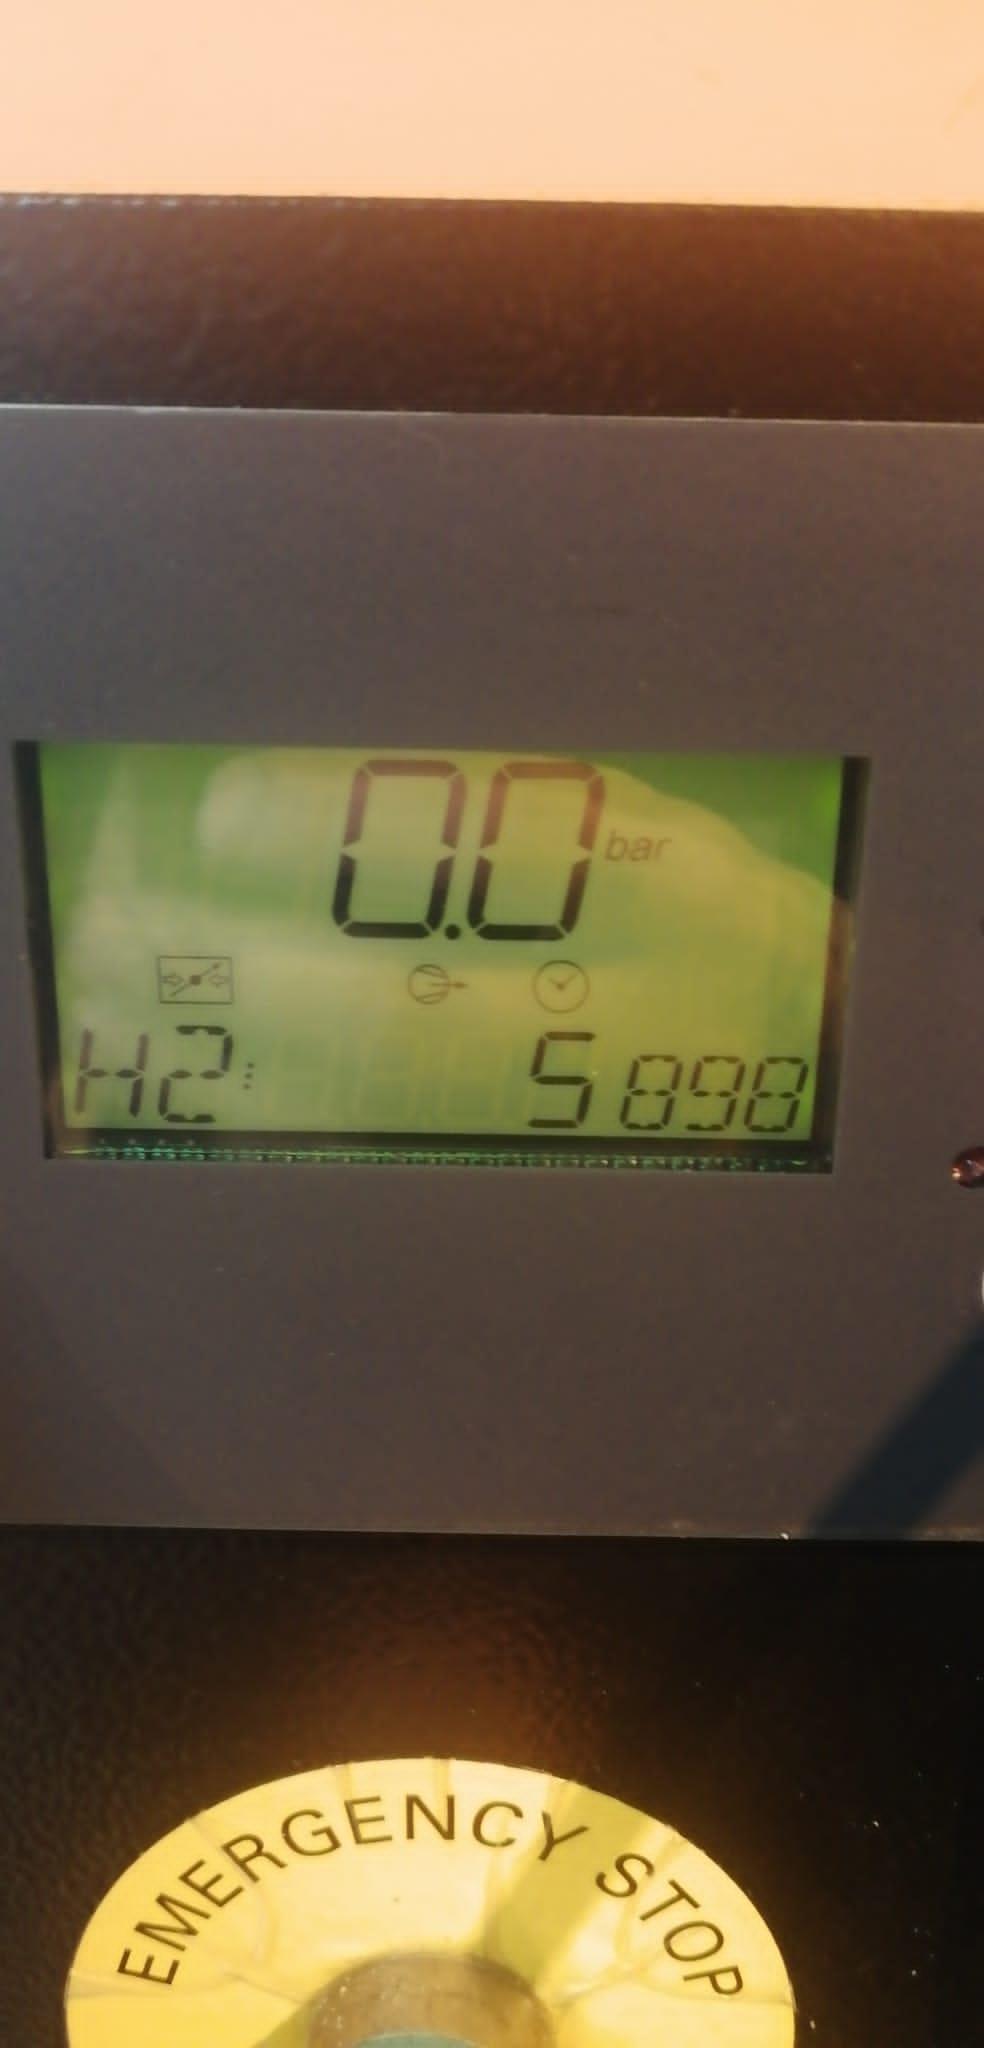 Avelair Opus 9ER7.5 10hp 9 bar 39cfm